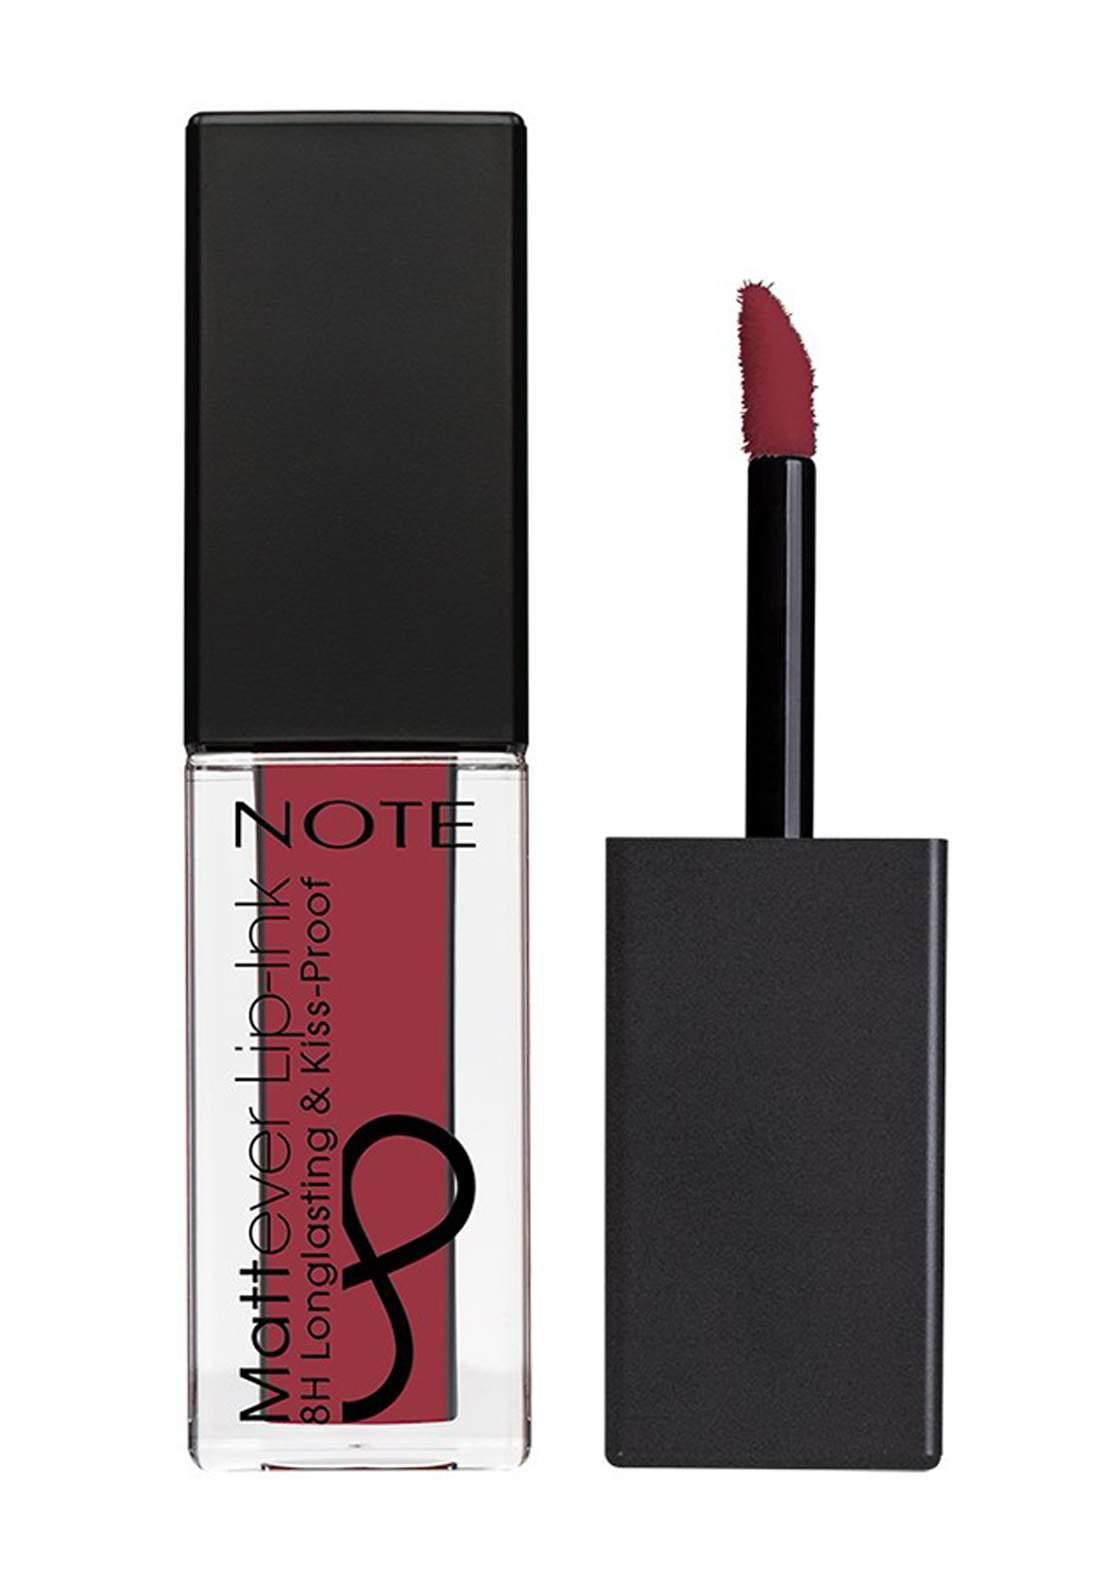 Note Cosmetics Mattever Lip Ink No.08  Antique Pink 4.5ml احمر شفاه